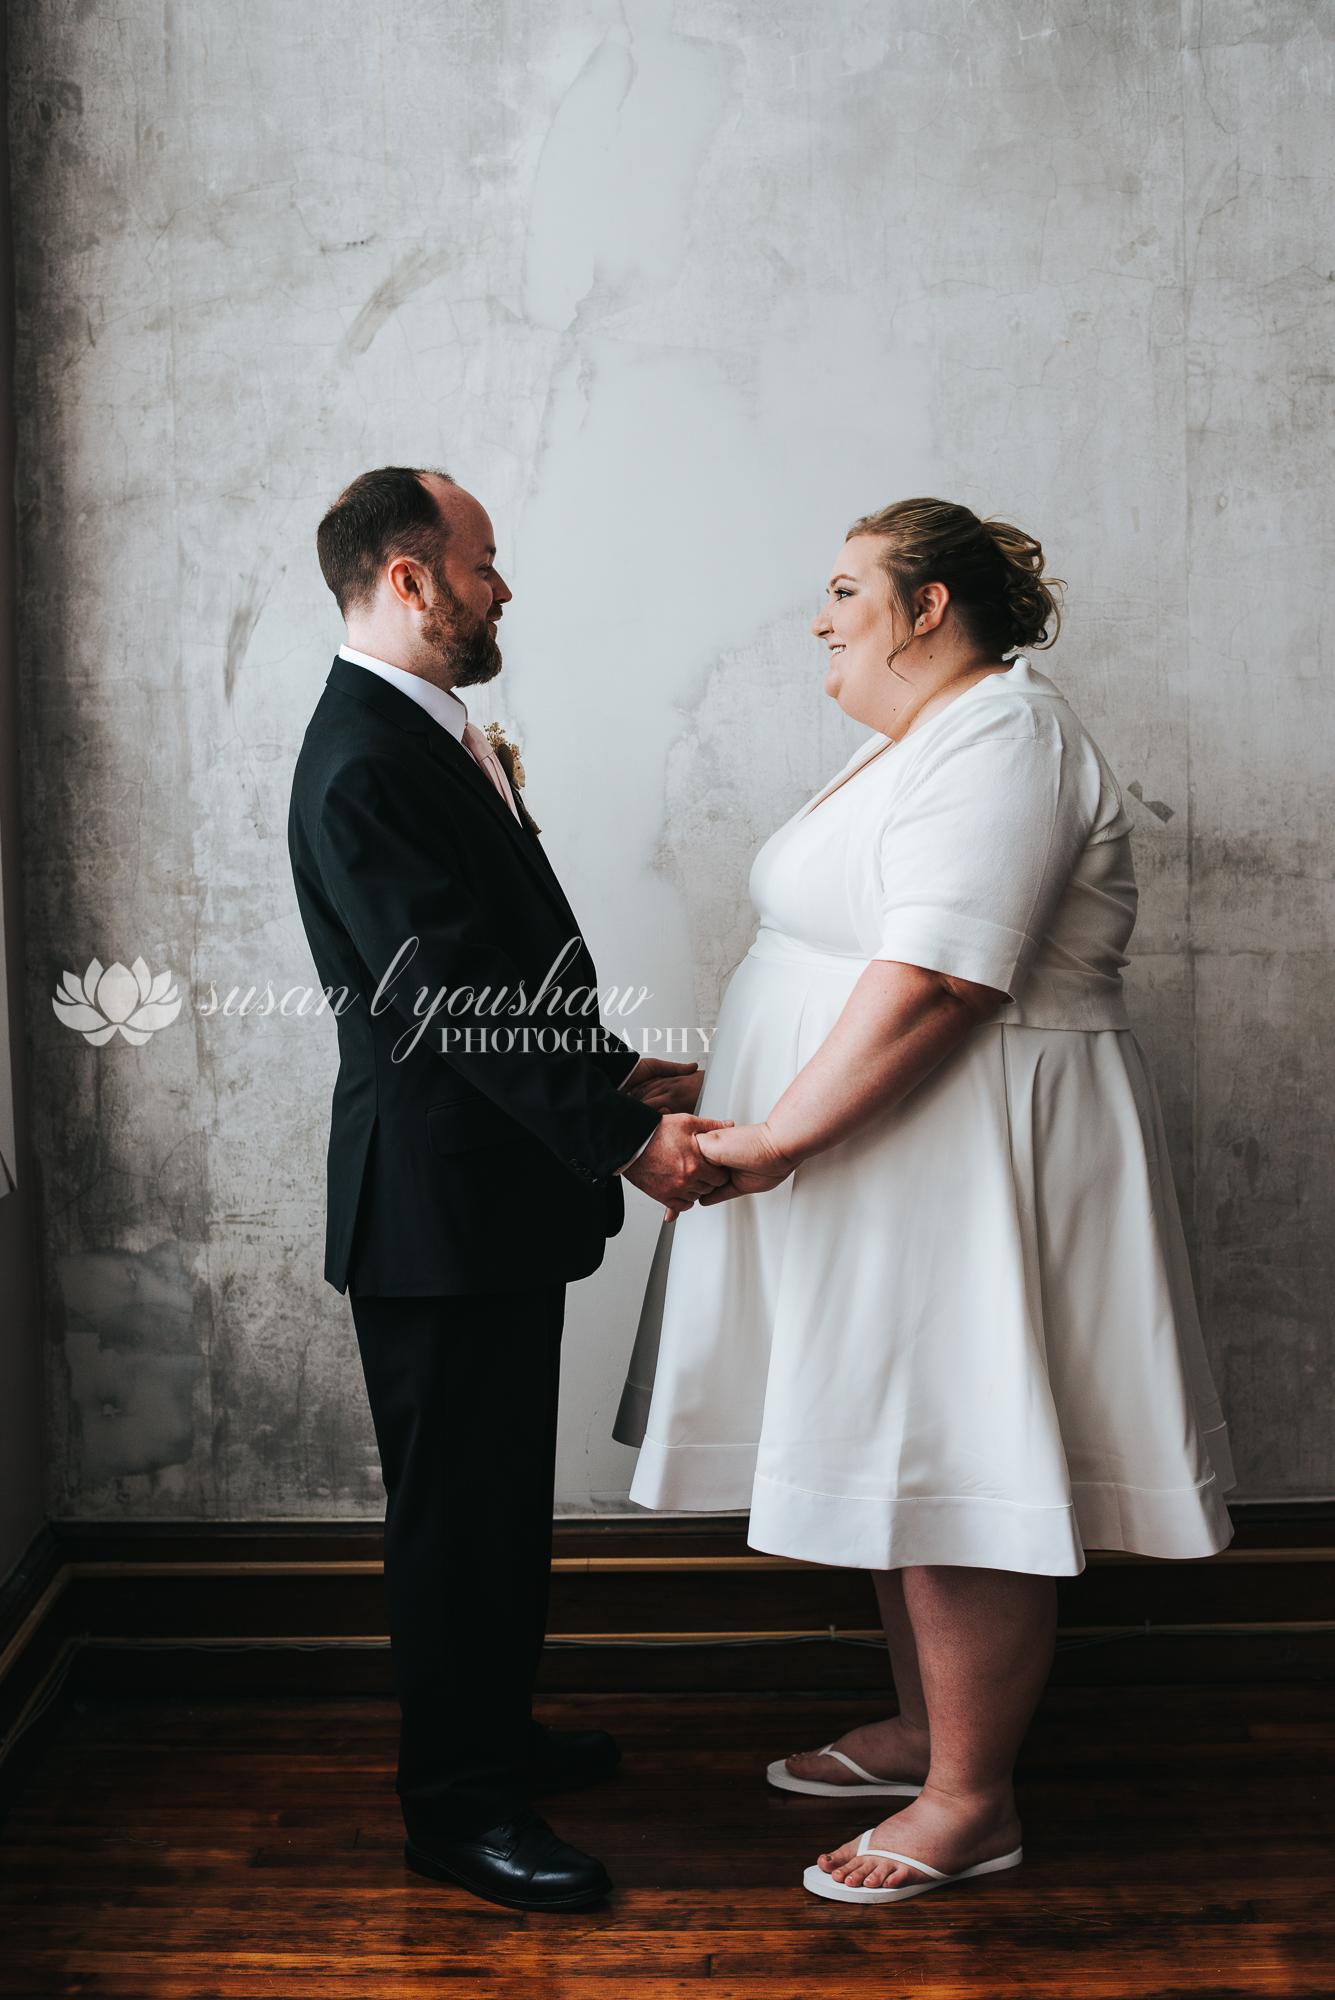 Bill and Sarah Wedding Photos 06-08-2019 SLY Photography -17.jpg